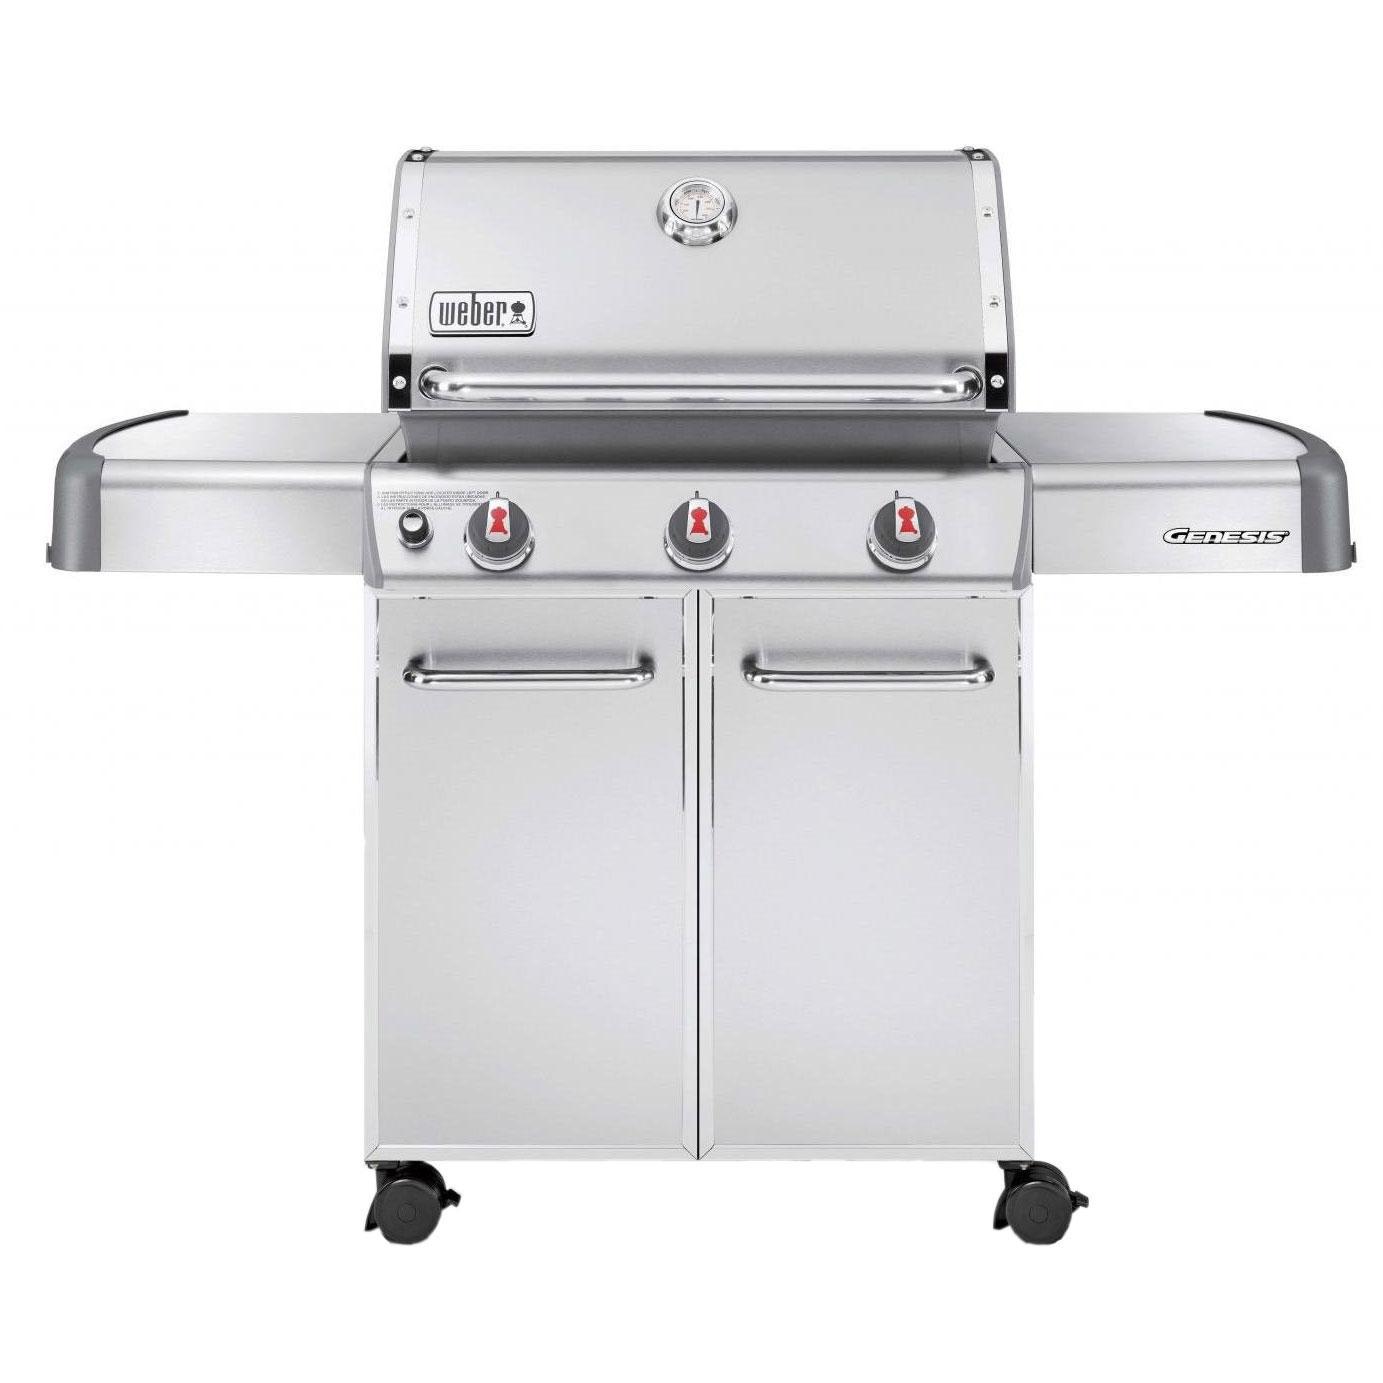 sales for weber genesis s 310 propane gas grill on cart. Black Bedroom Furniture Sets. Home Design Ideas